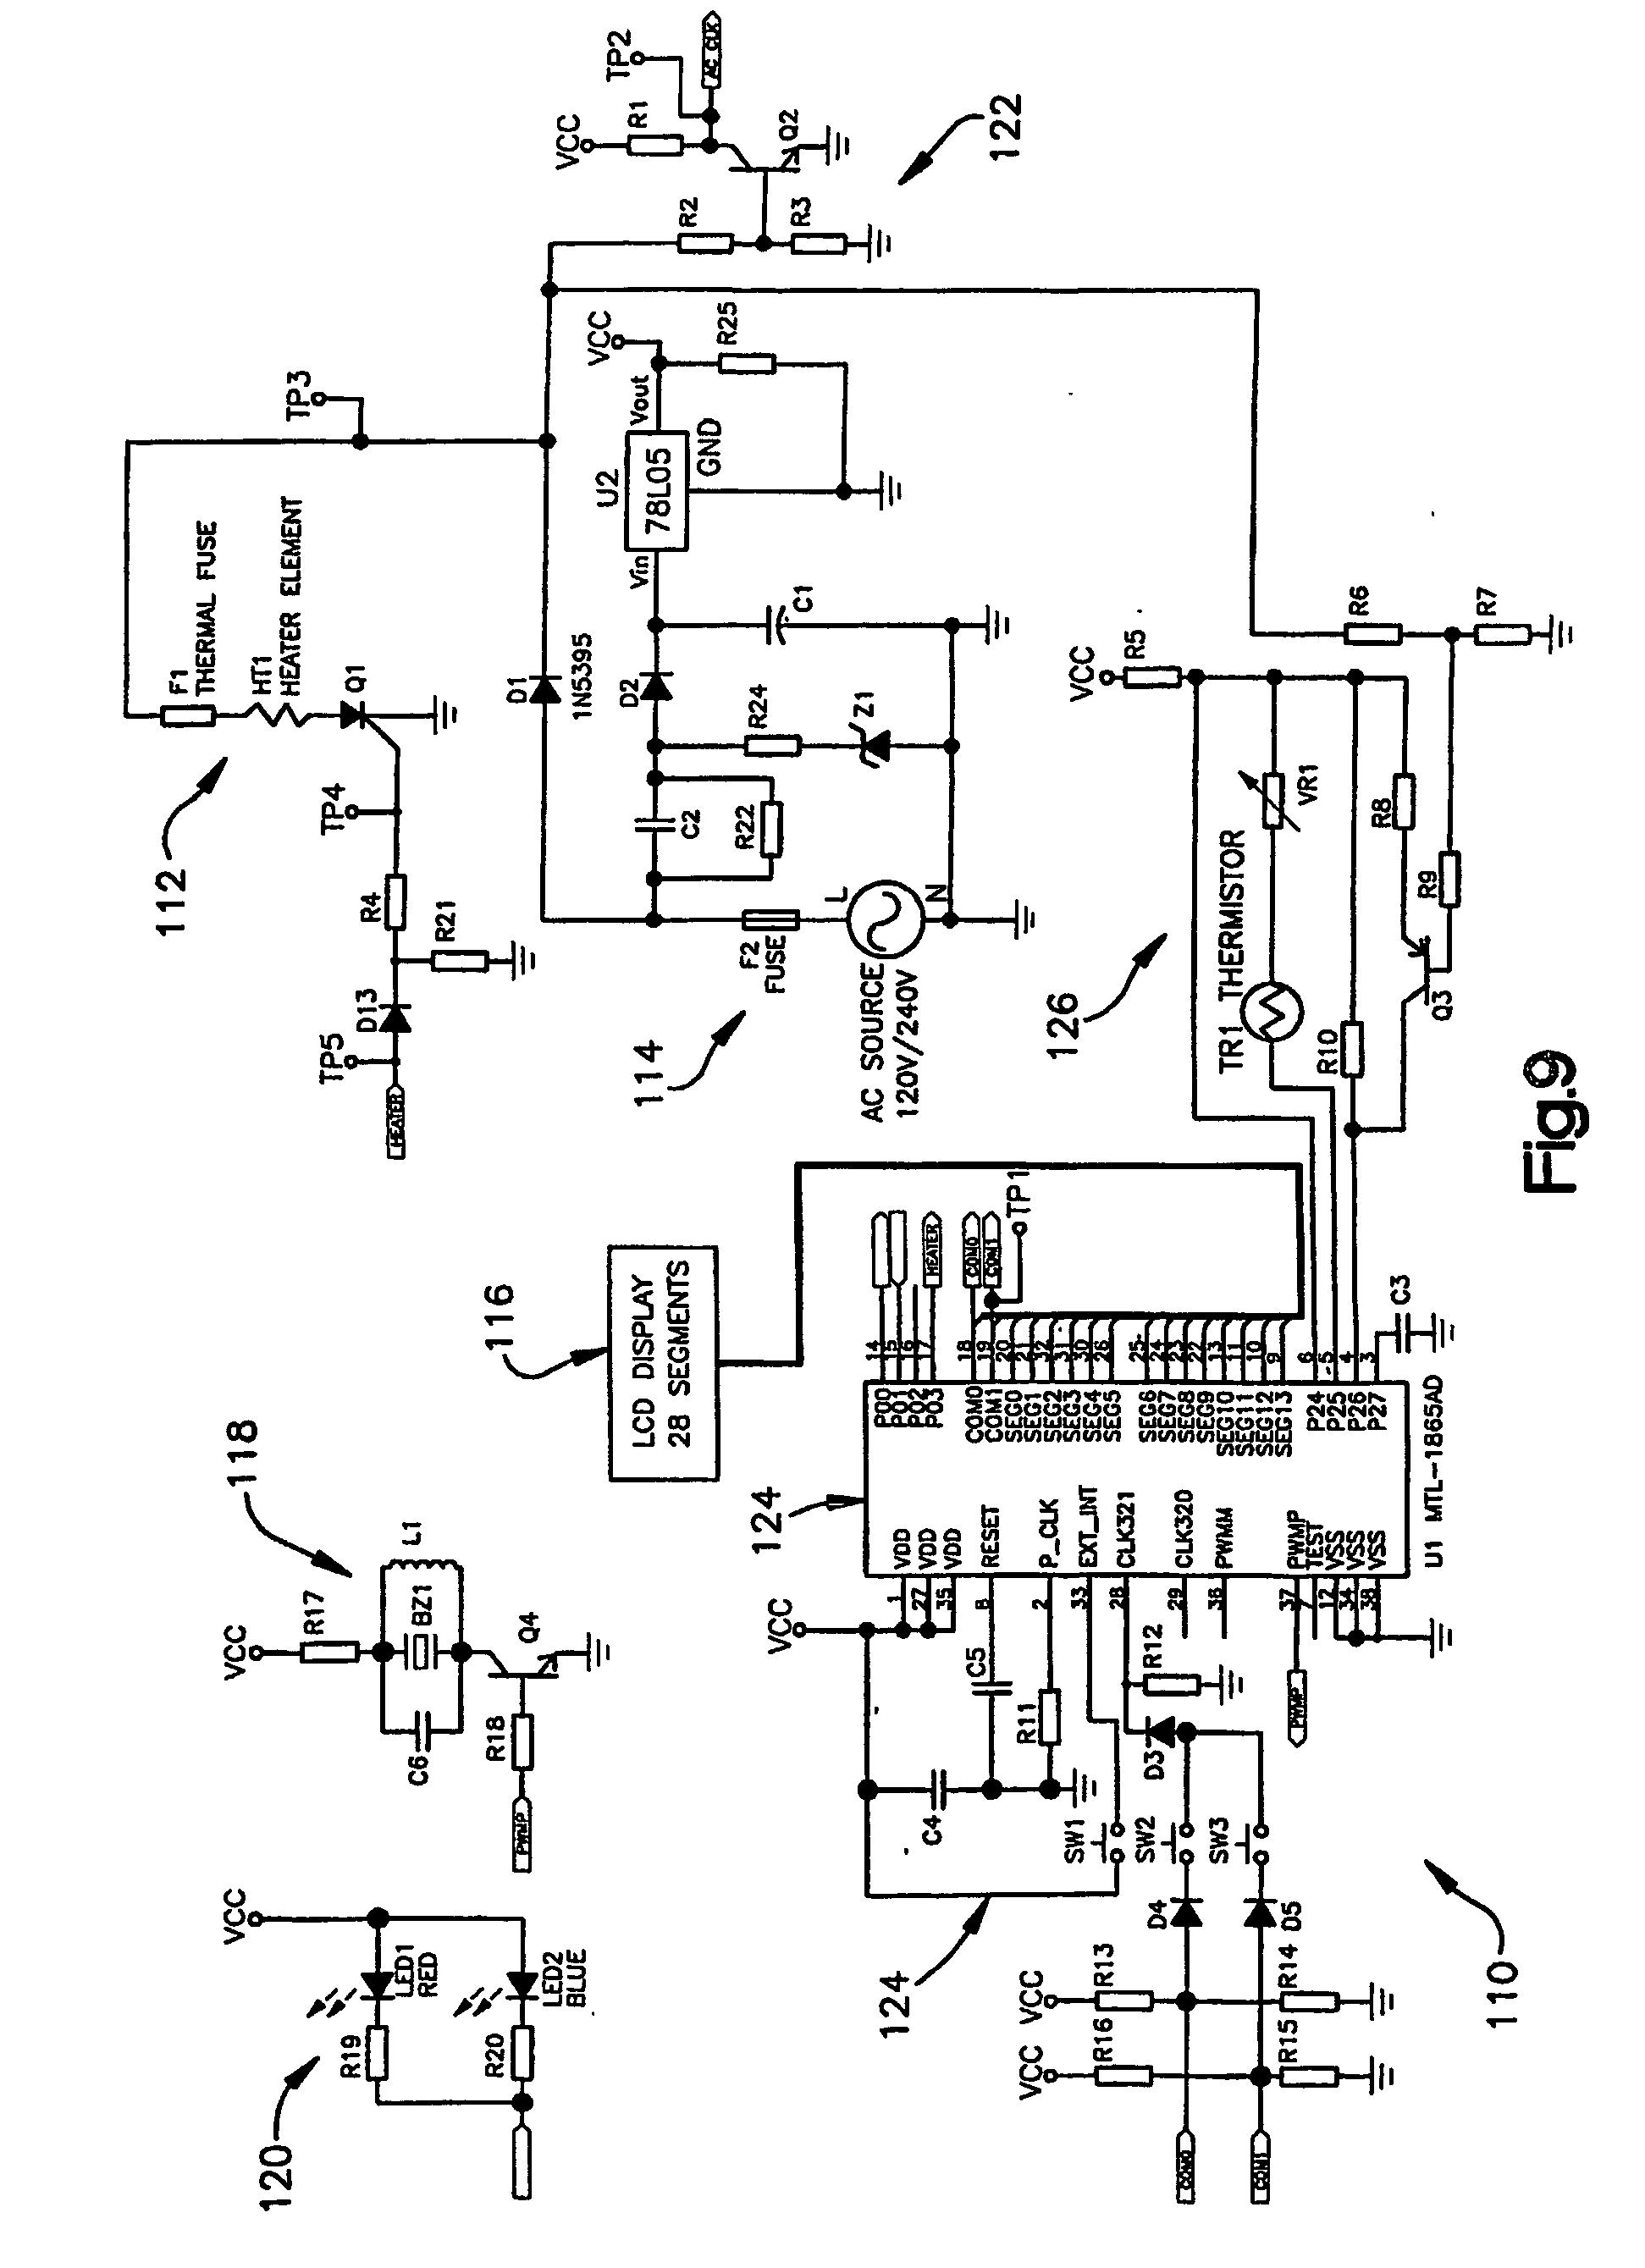 conair hair dryer wiring diagram